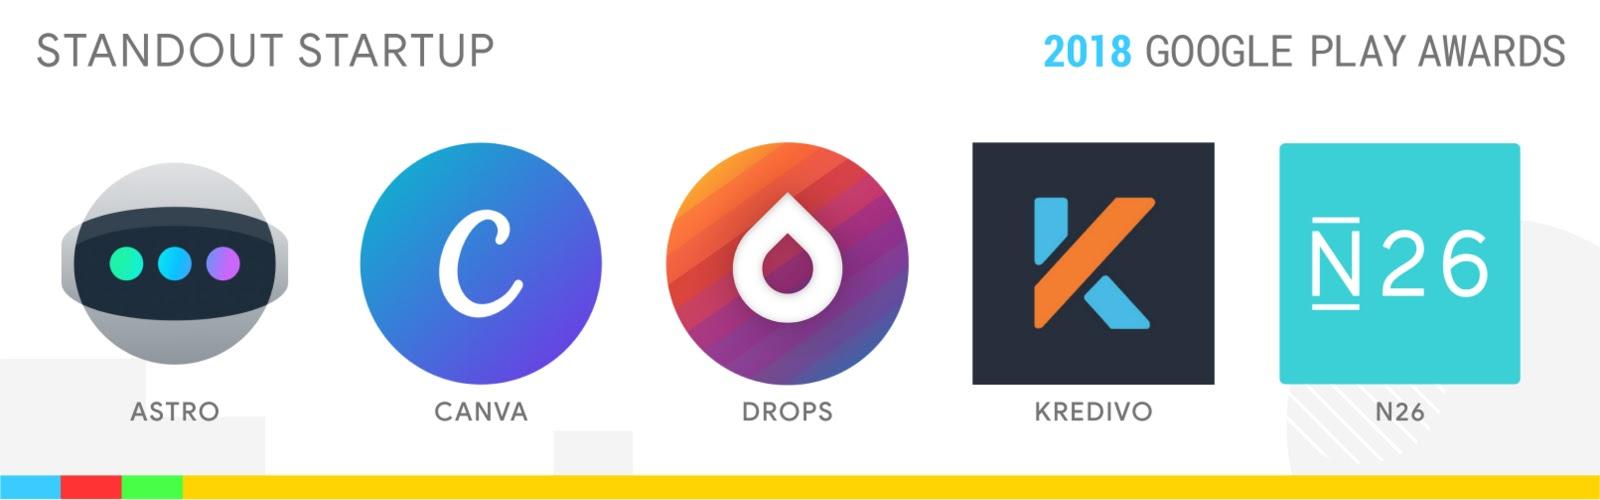 Standout Startup: Astro, Canva, Drops, Kredivo, N26